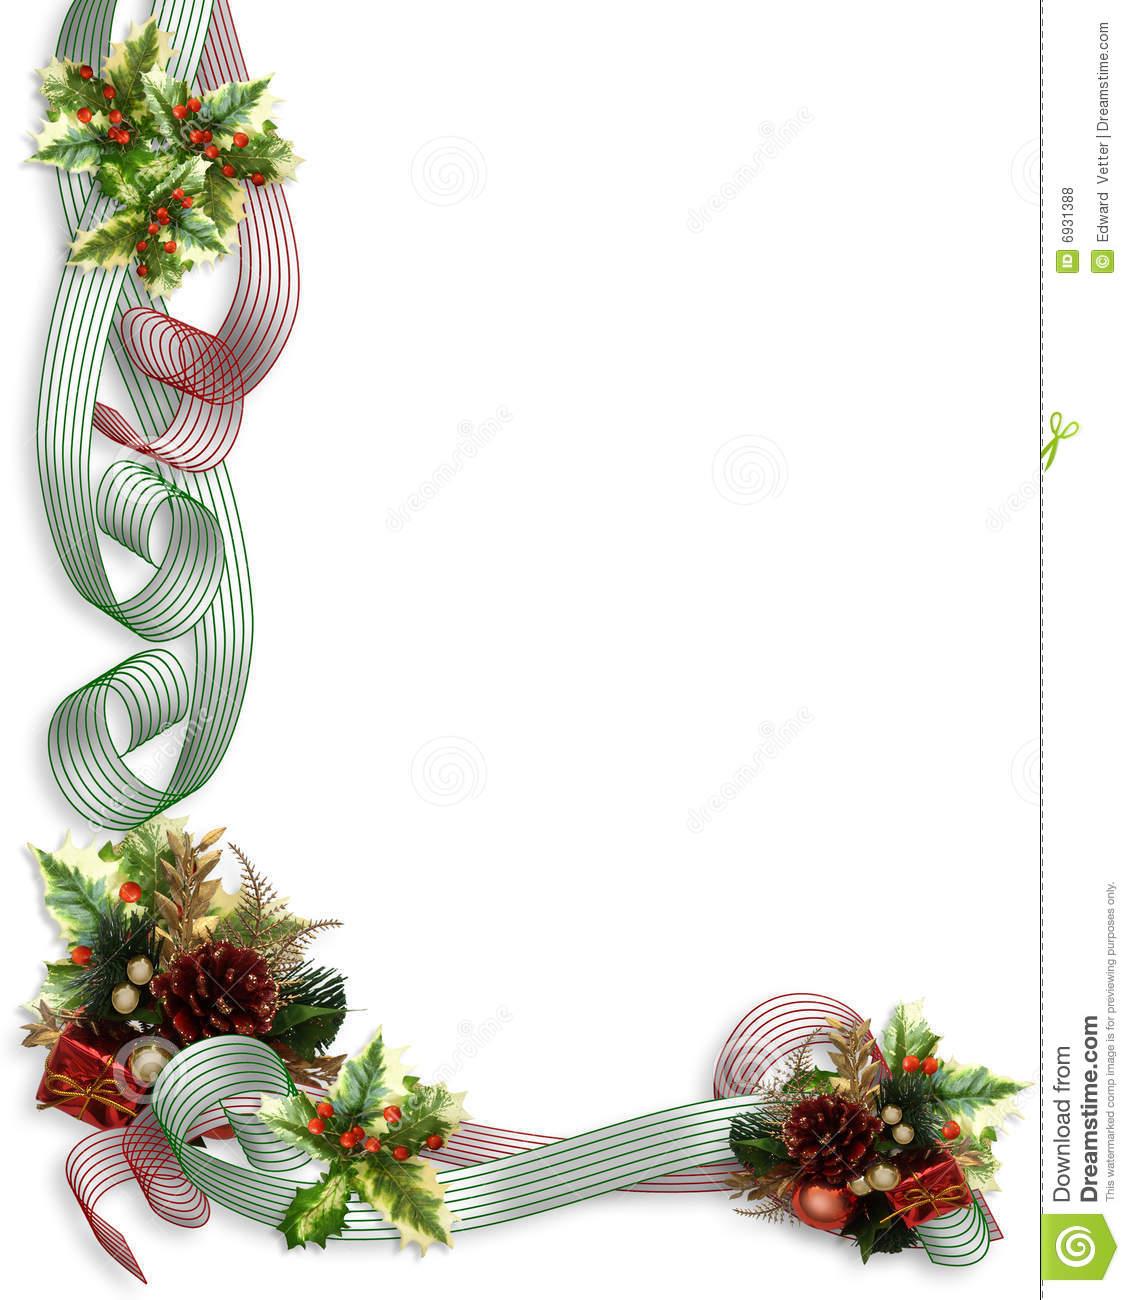 http://www.newdesignfile.com/postpic/2009/03/free-christmas-holly-ribbon-border_387993.jpg